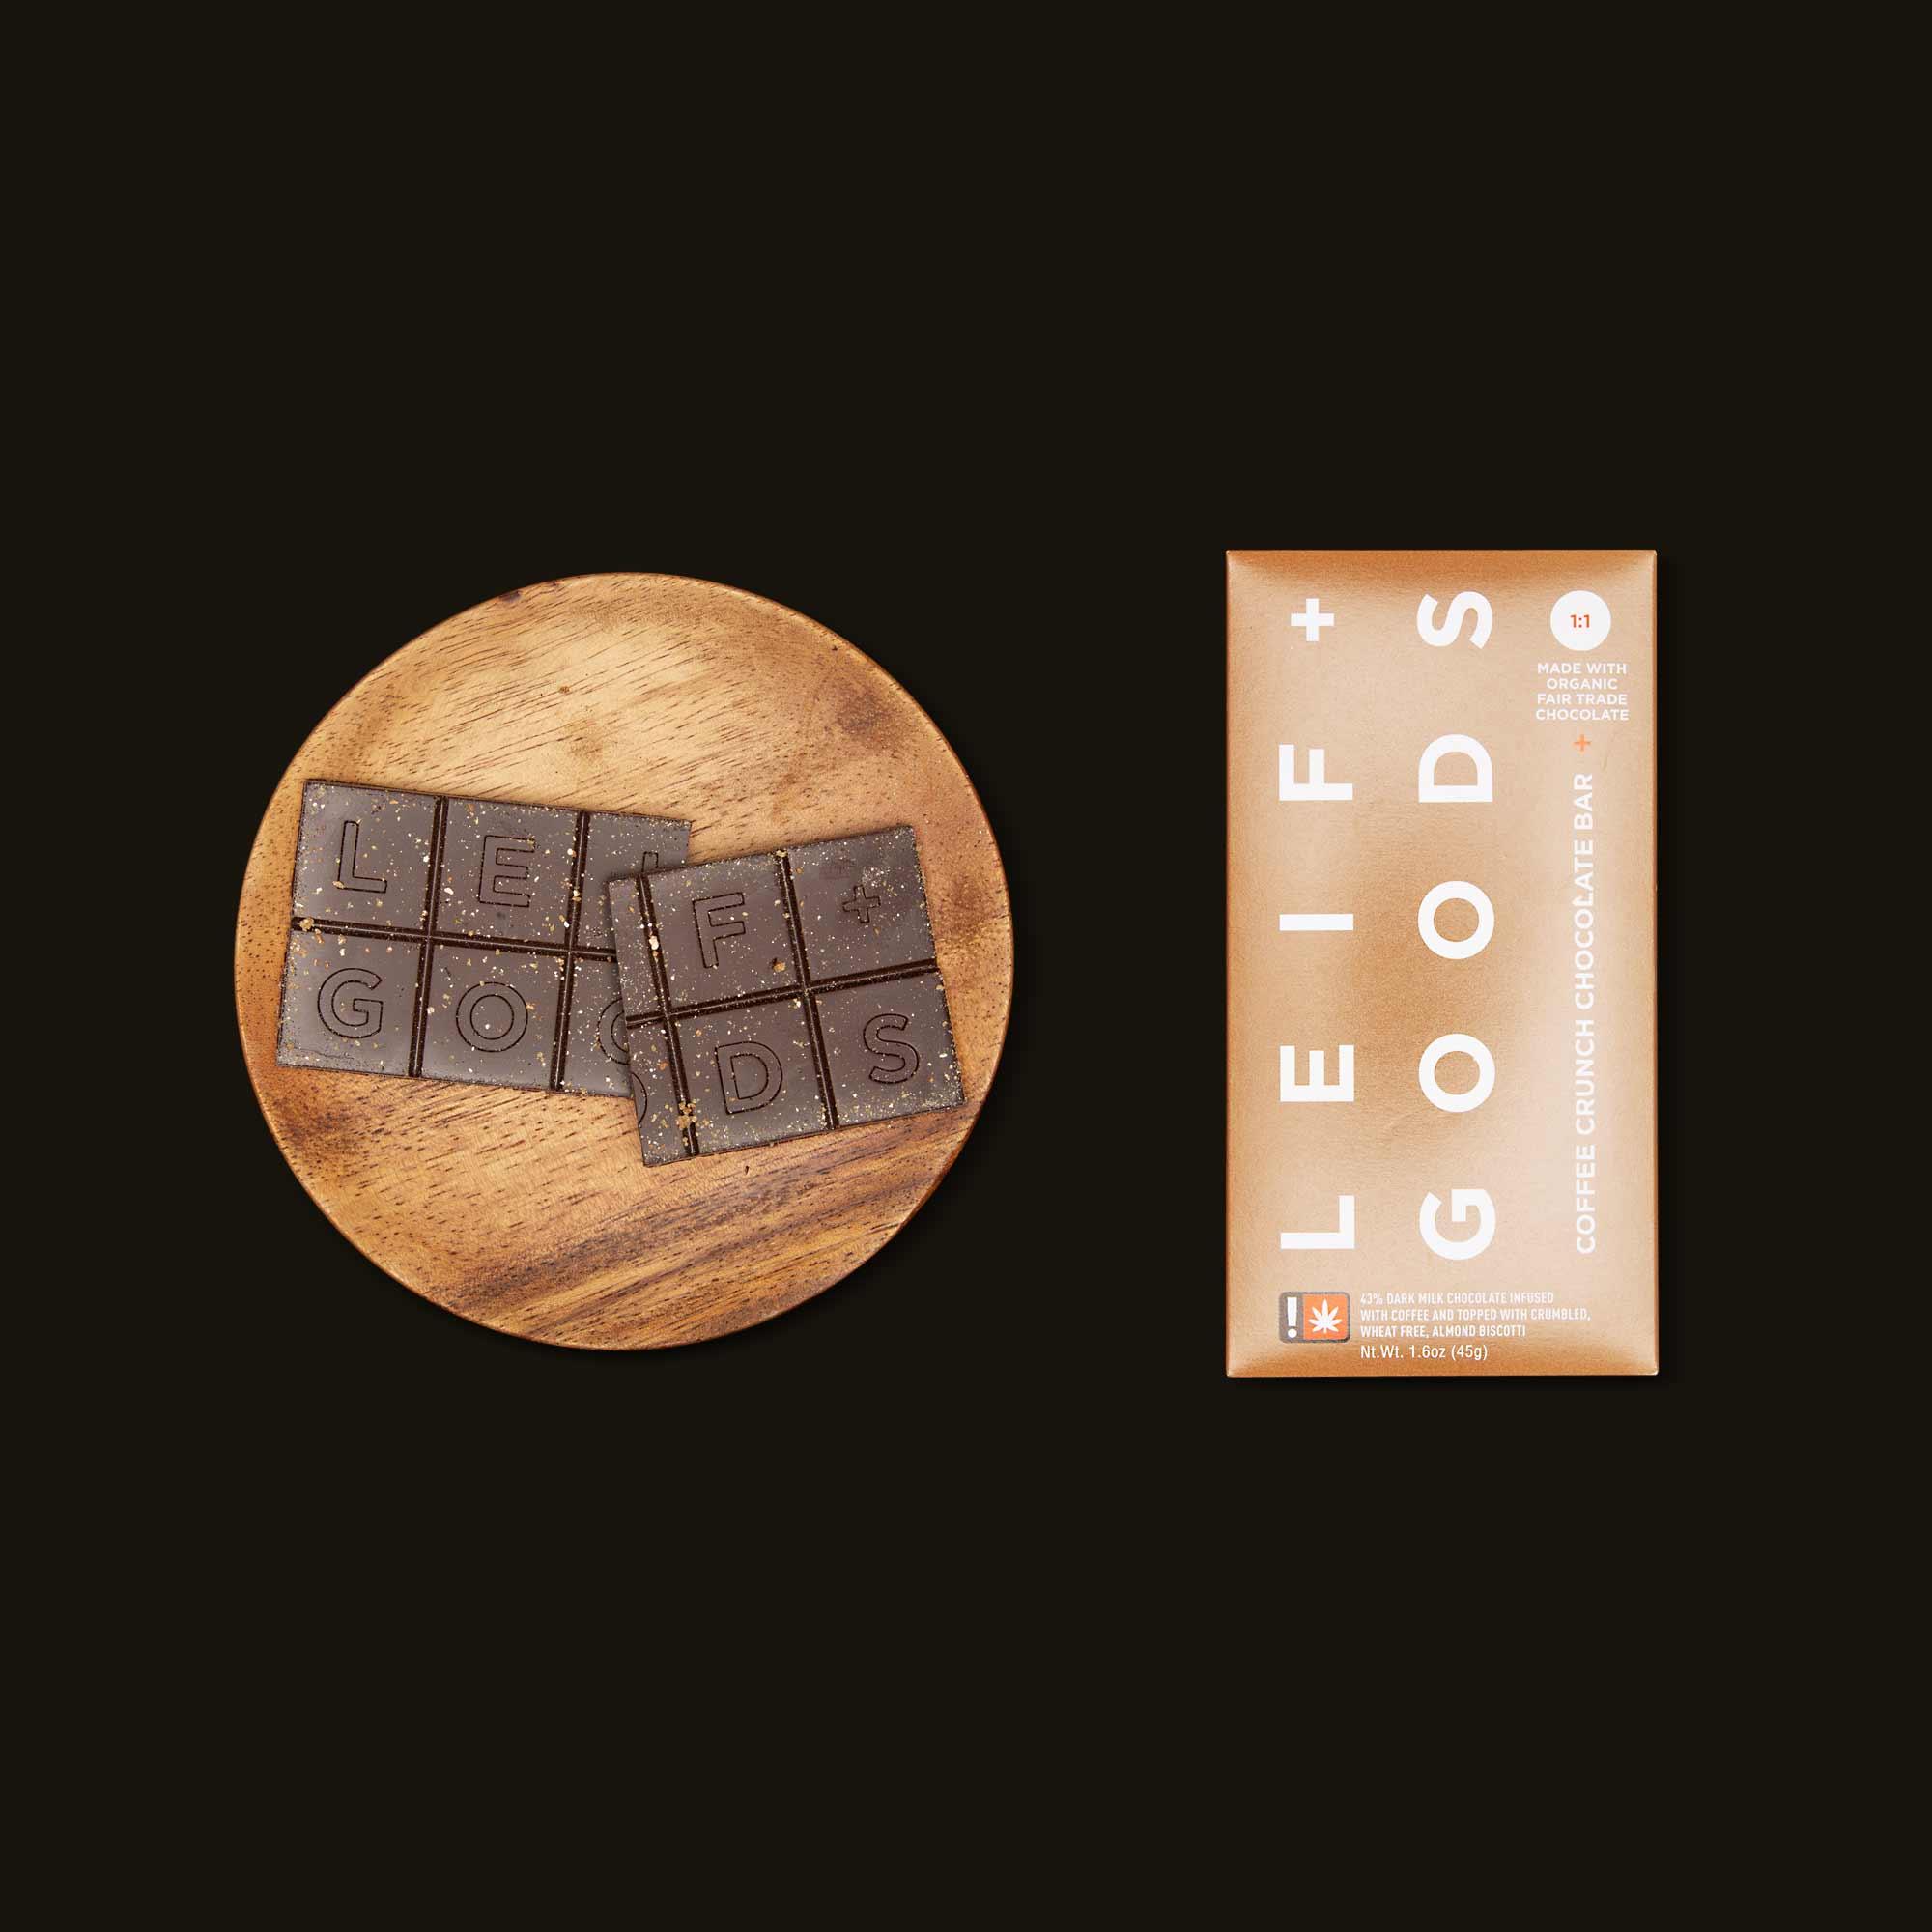 Leif Goods Coffee Crunch Chocolate Bar